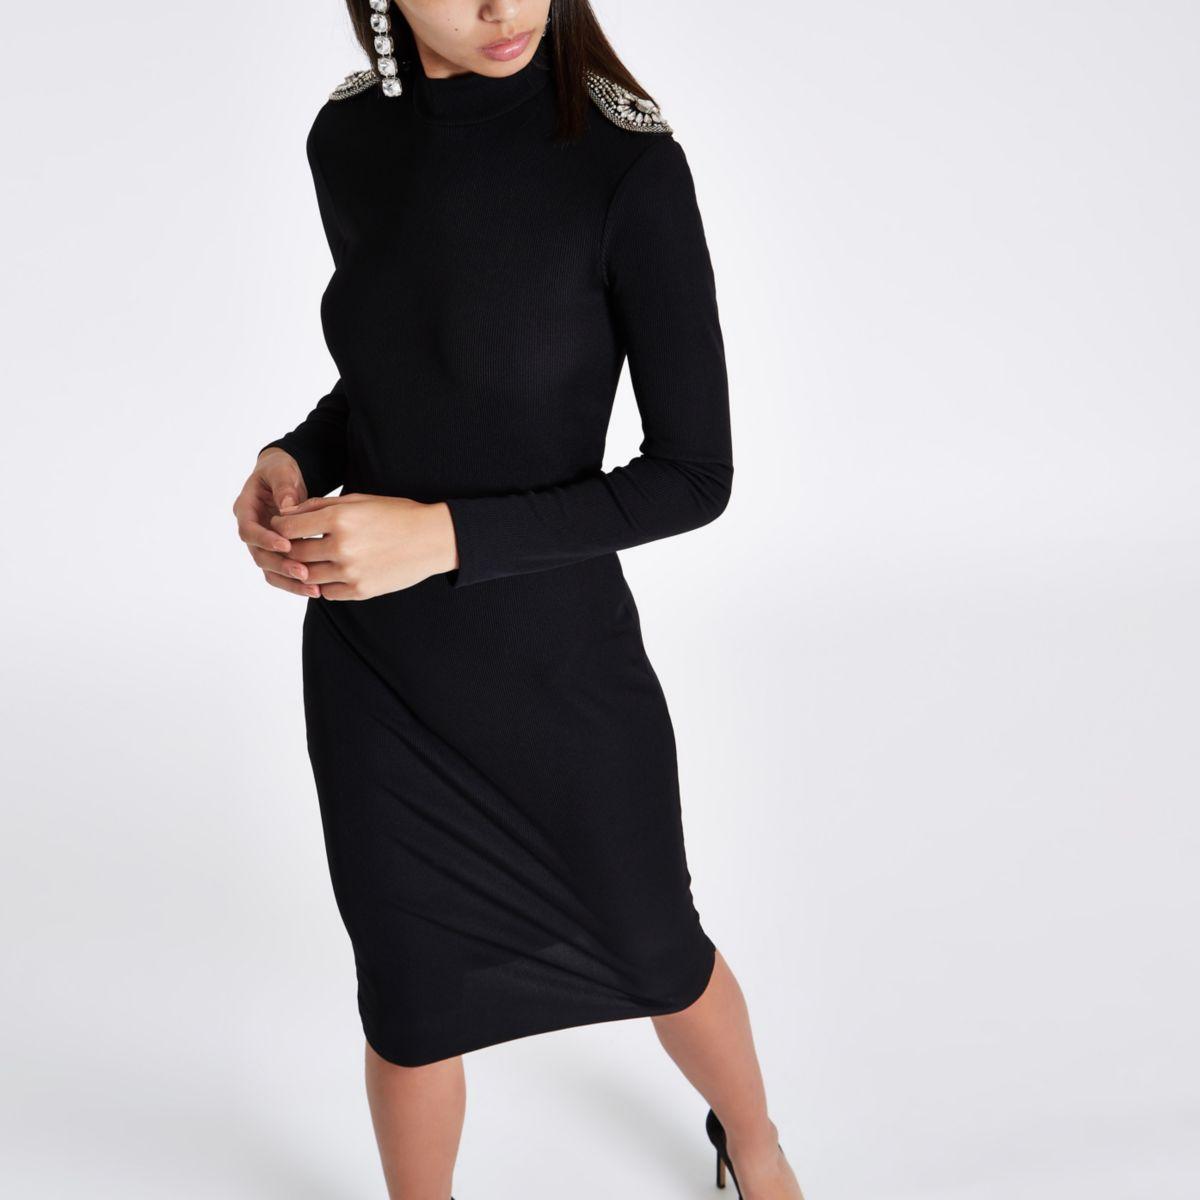 Black rhinestone shoulder bodycon midi dress